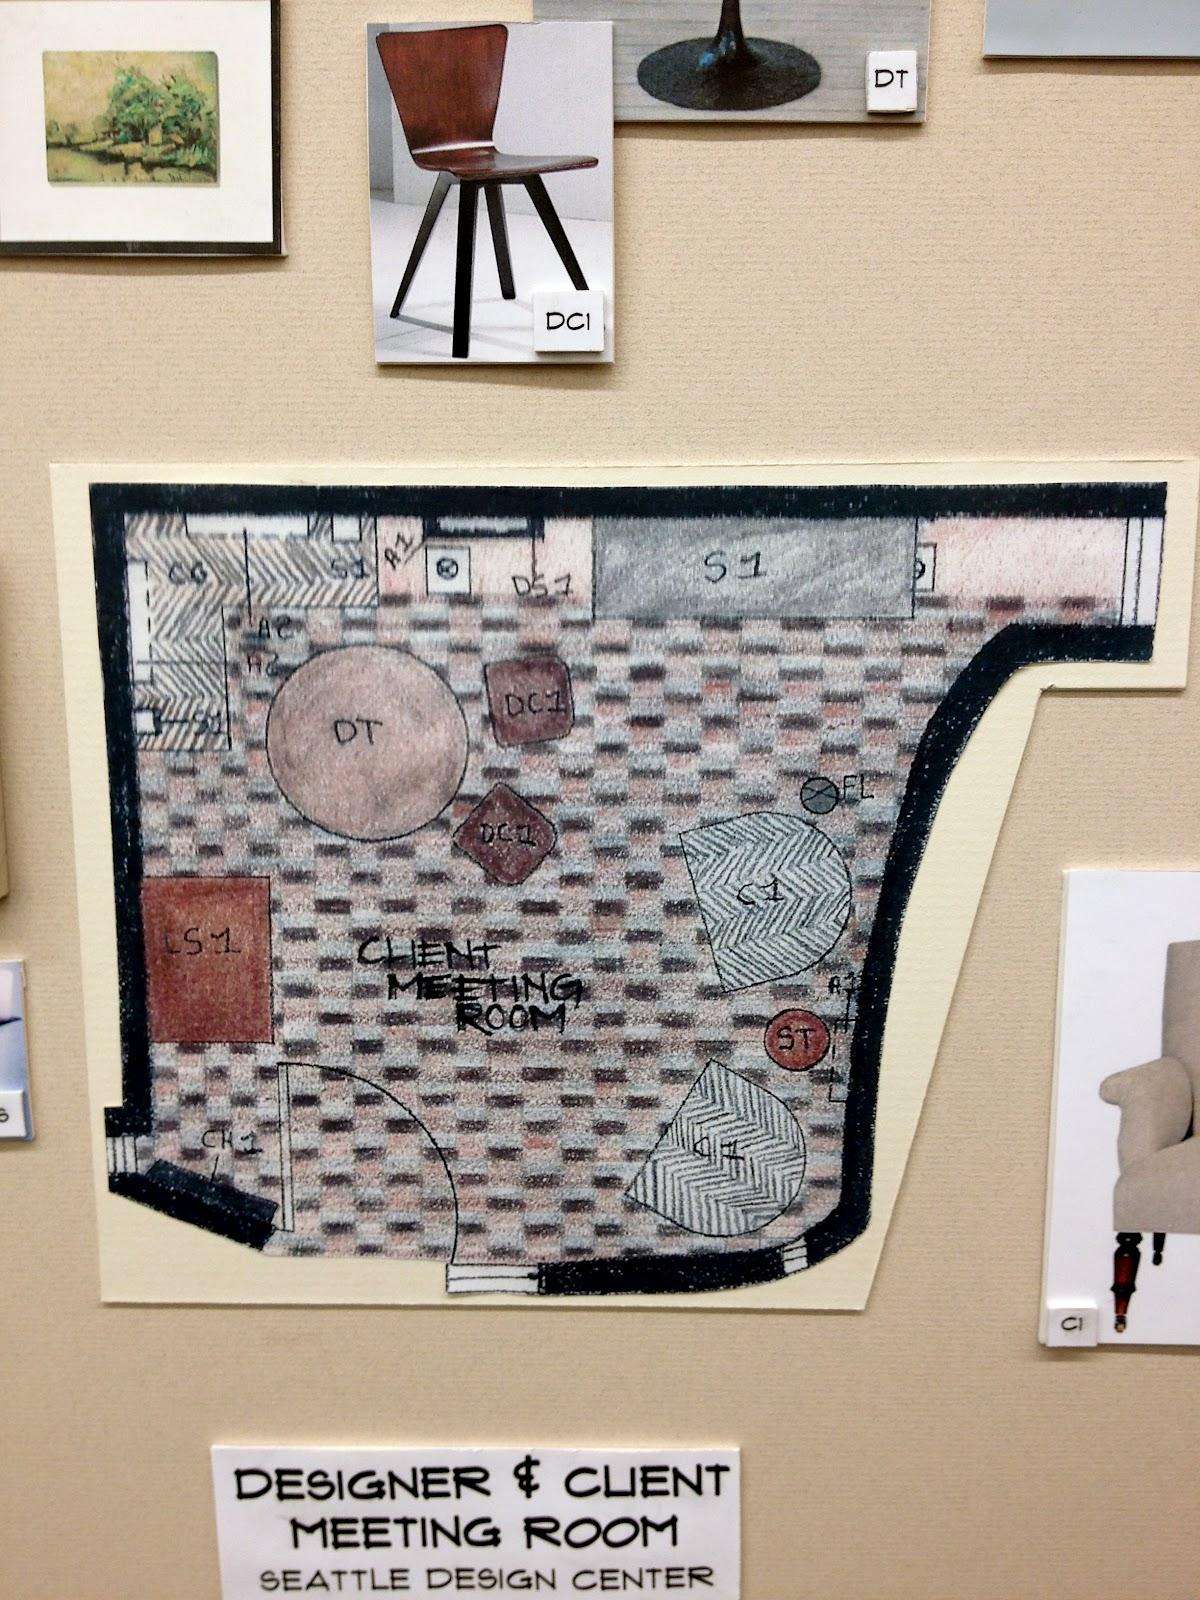 courtney lane My Interior Design Studio Project